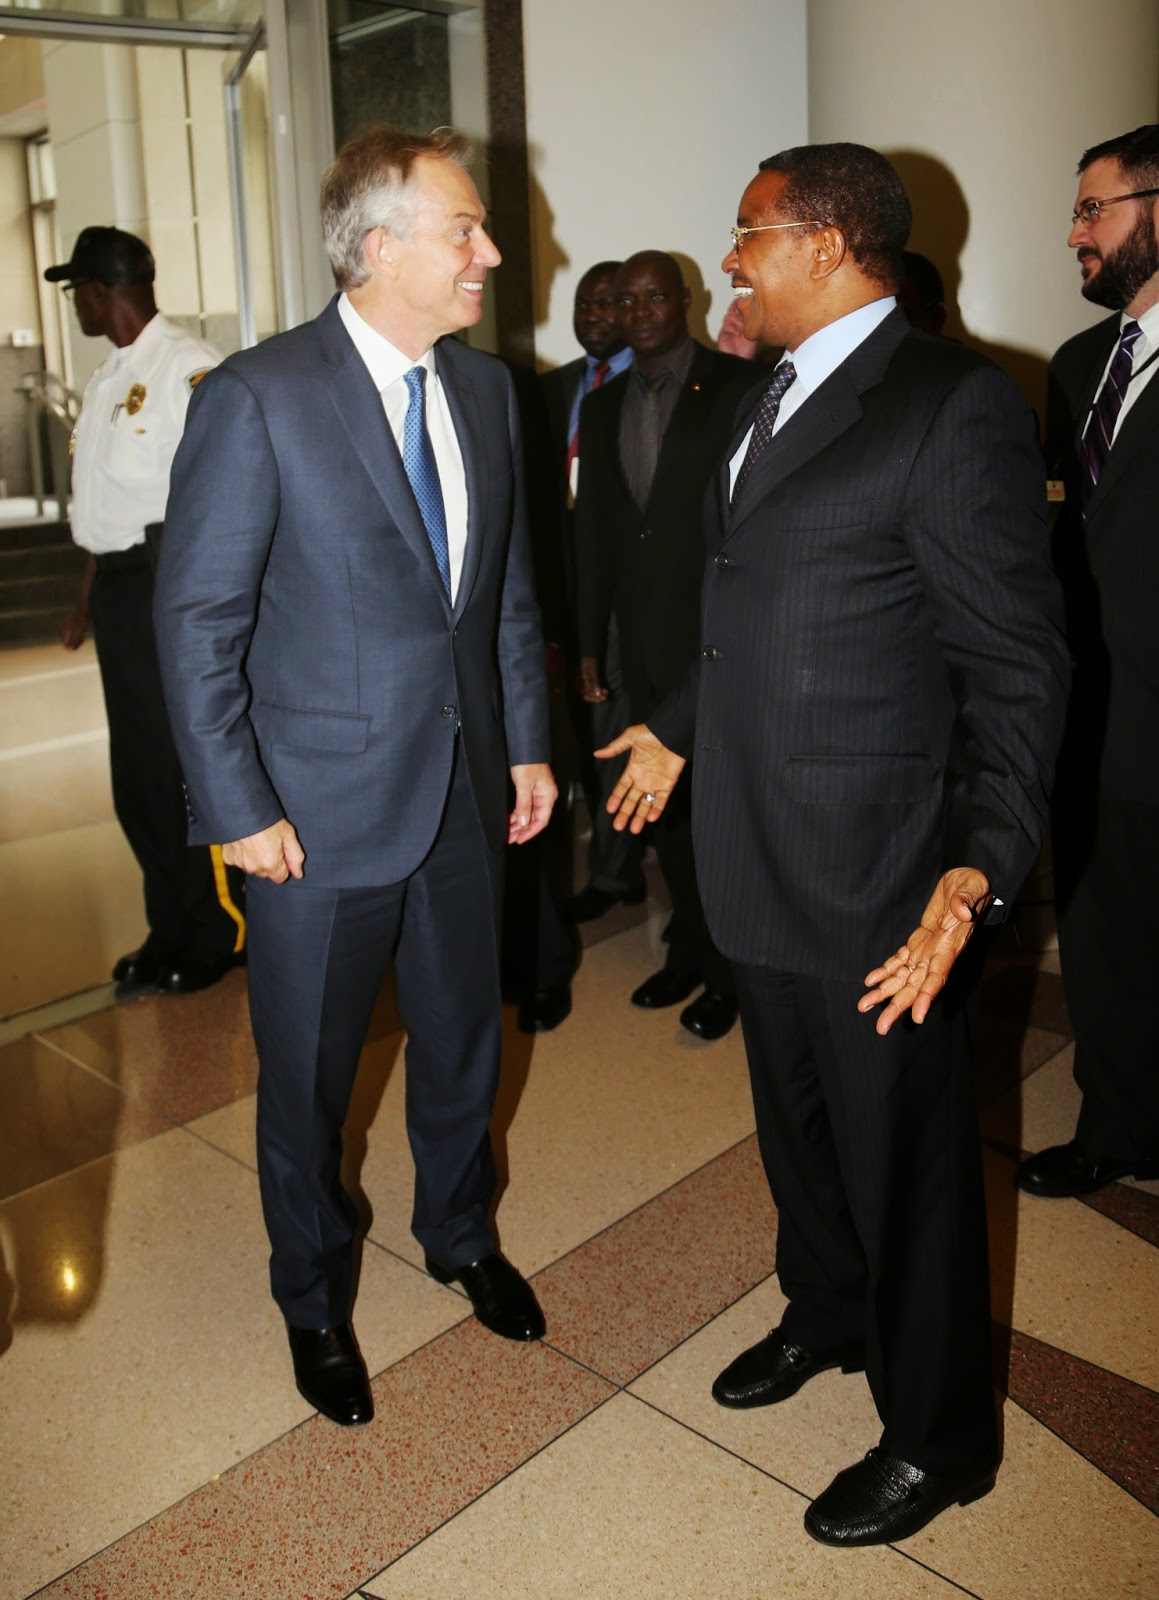 Speech by Pres. Kikwete addressing USAID forum in Washington, DC